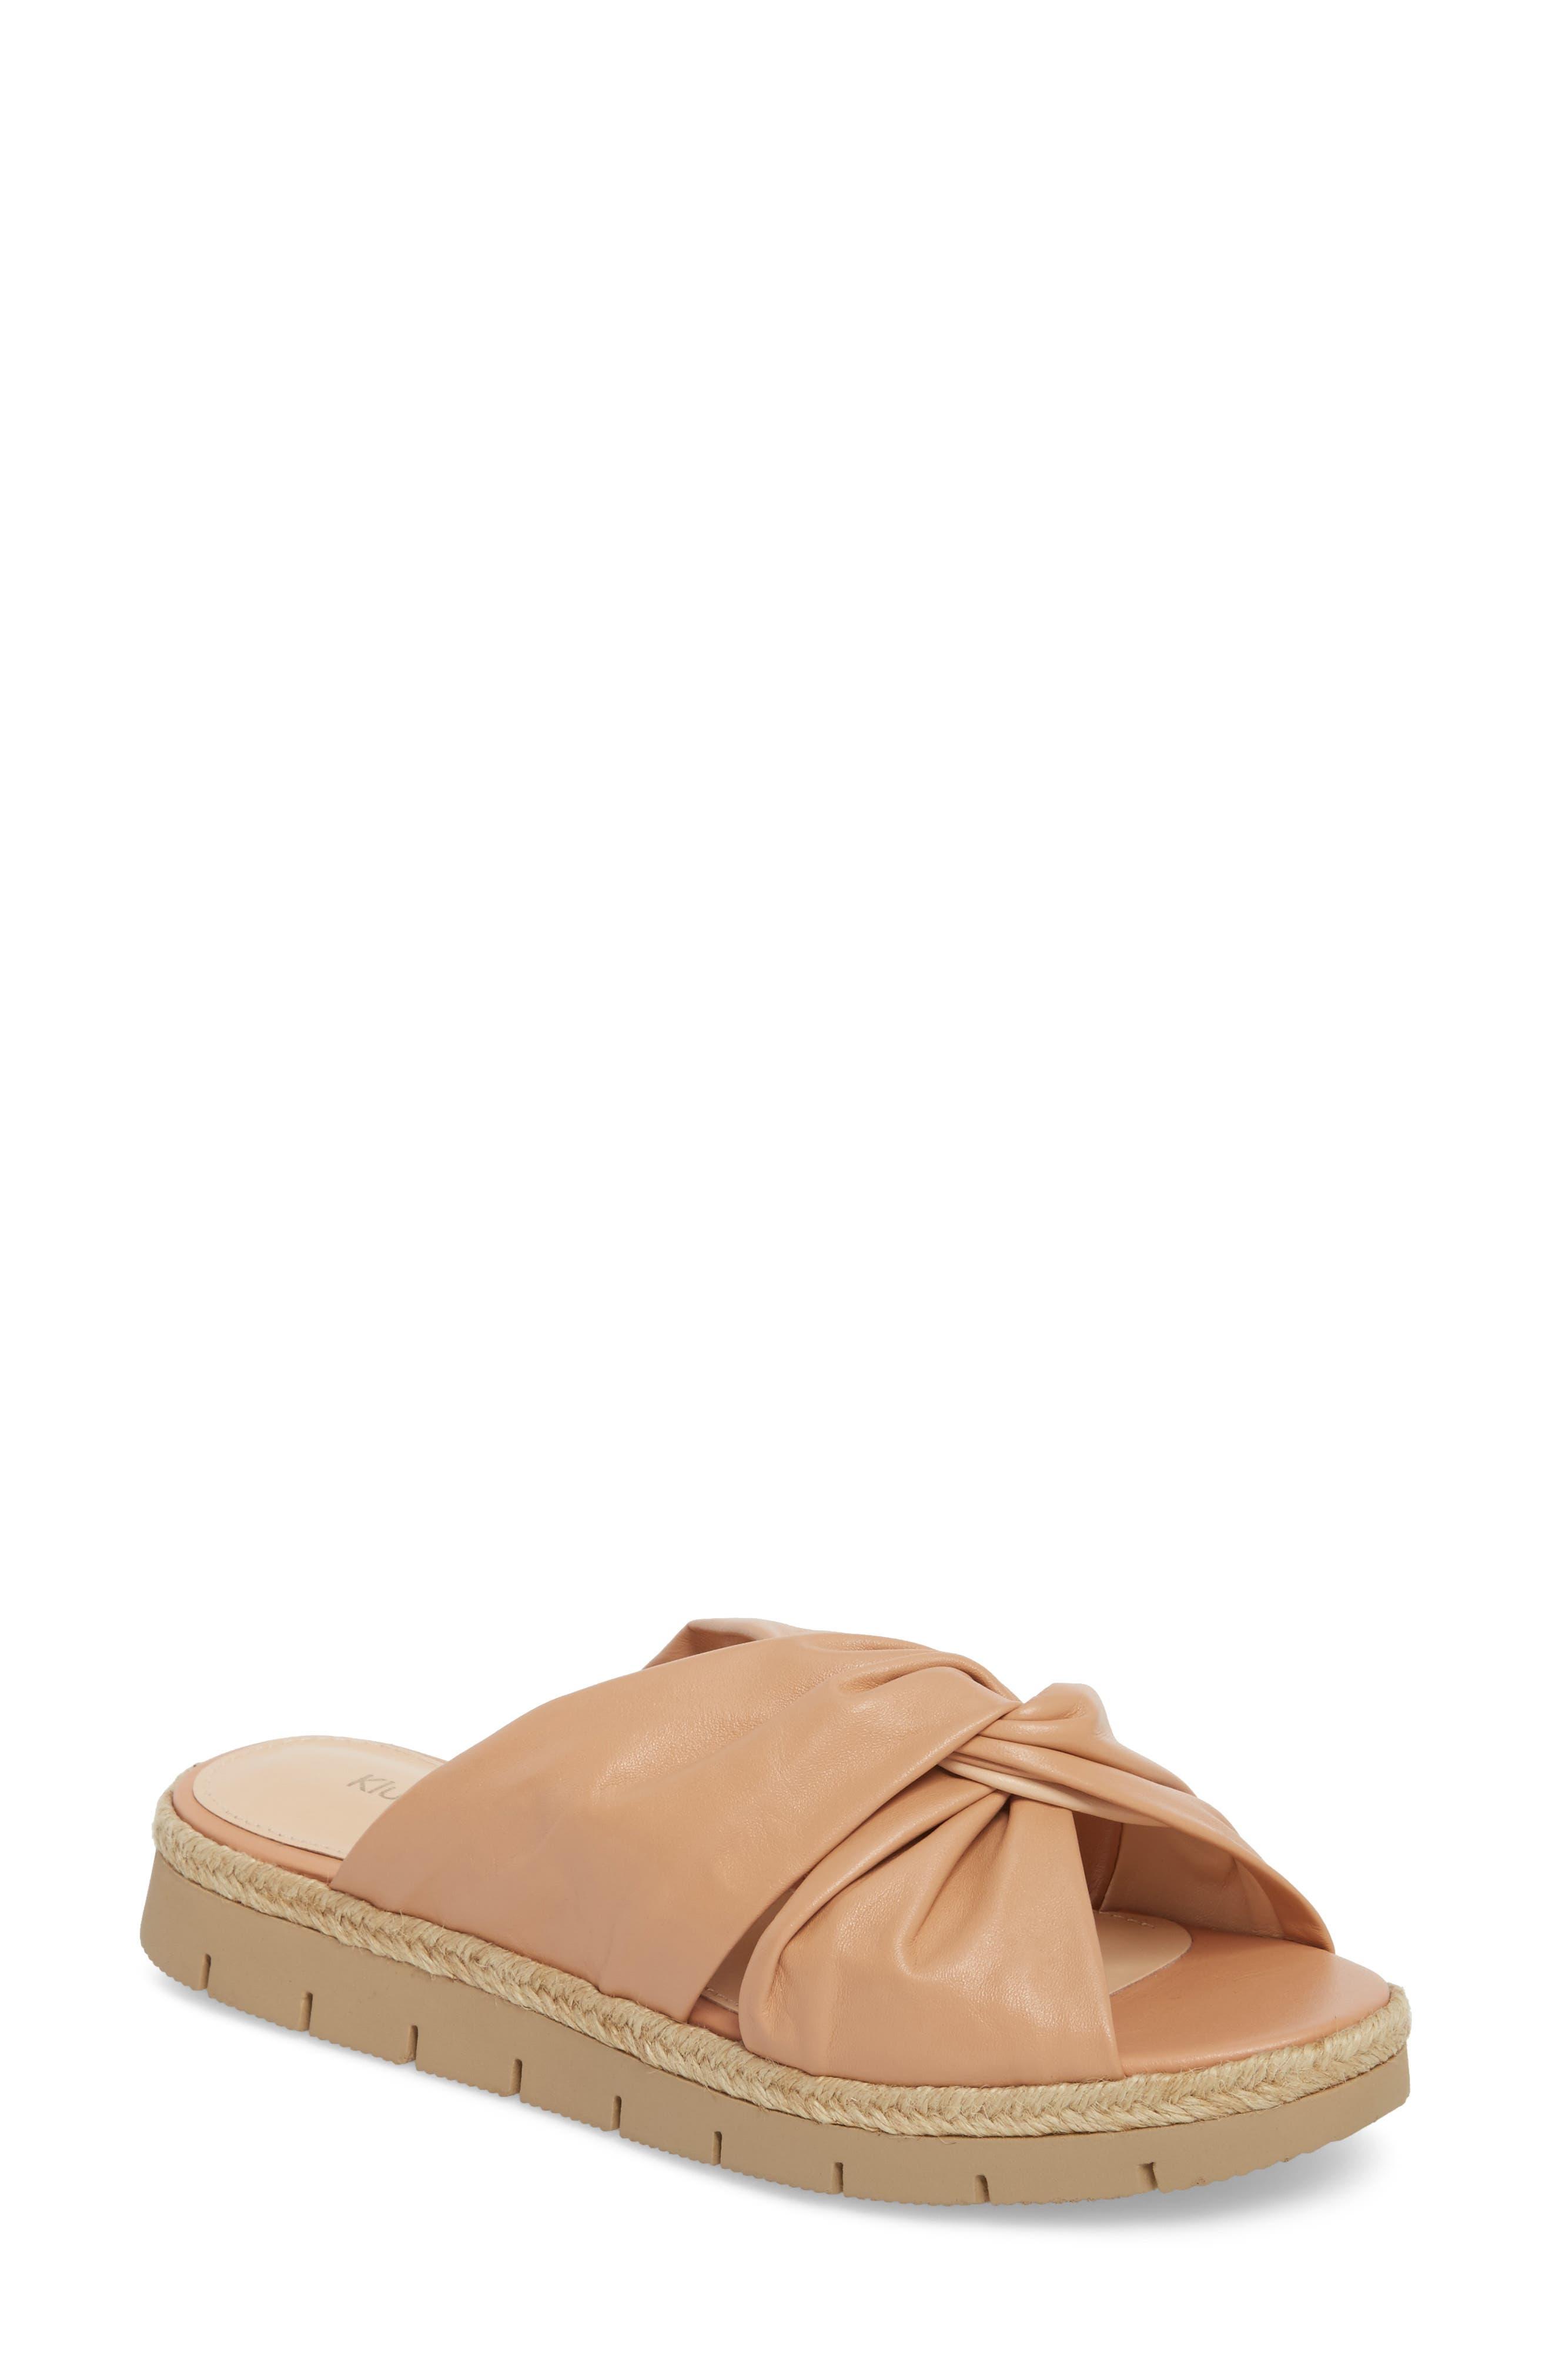 Klub Nico Charlie Slide Sandal, Orange